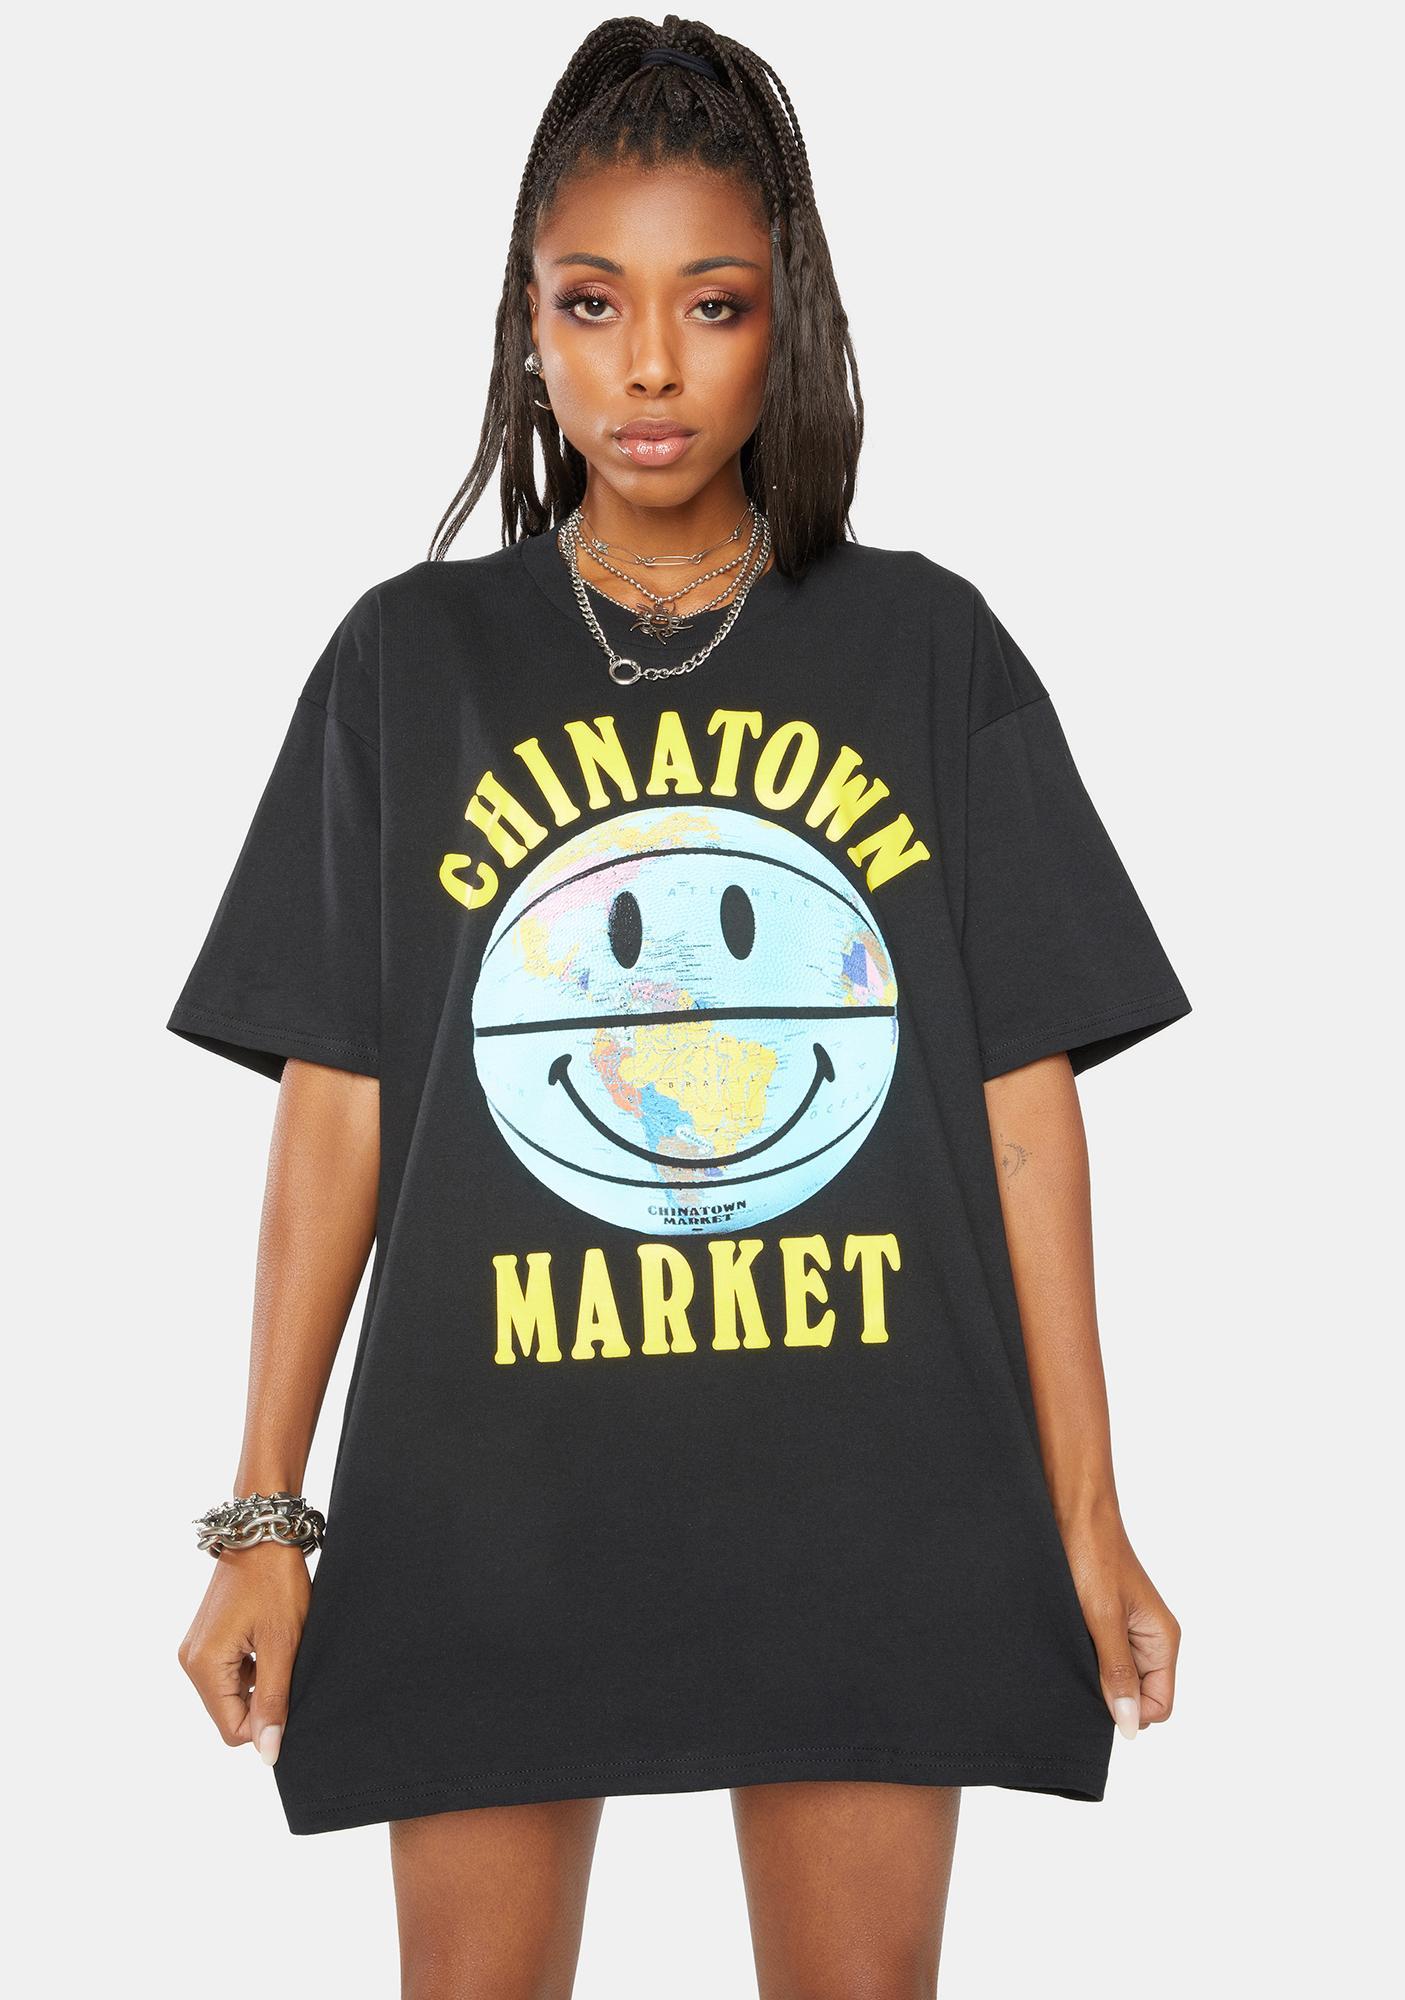 CHINATOWN MARKET Smiley Globe Ball Graphic Tee